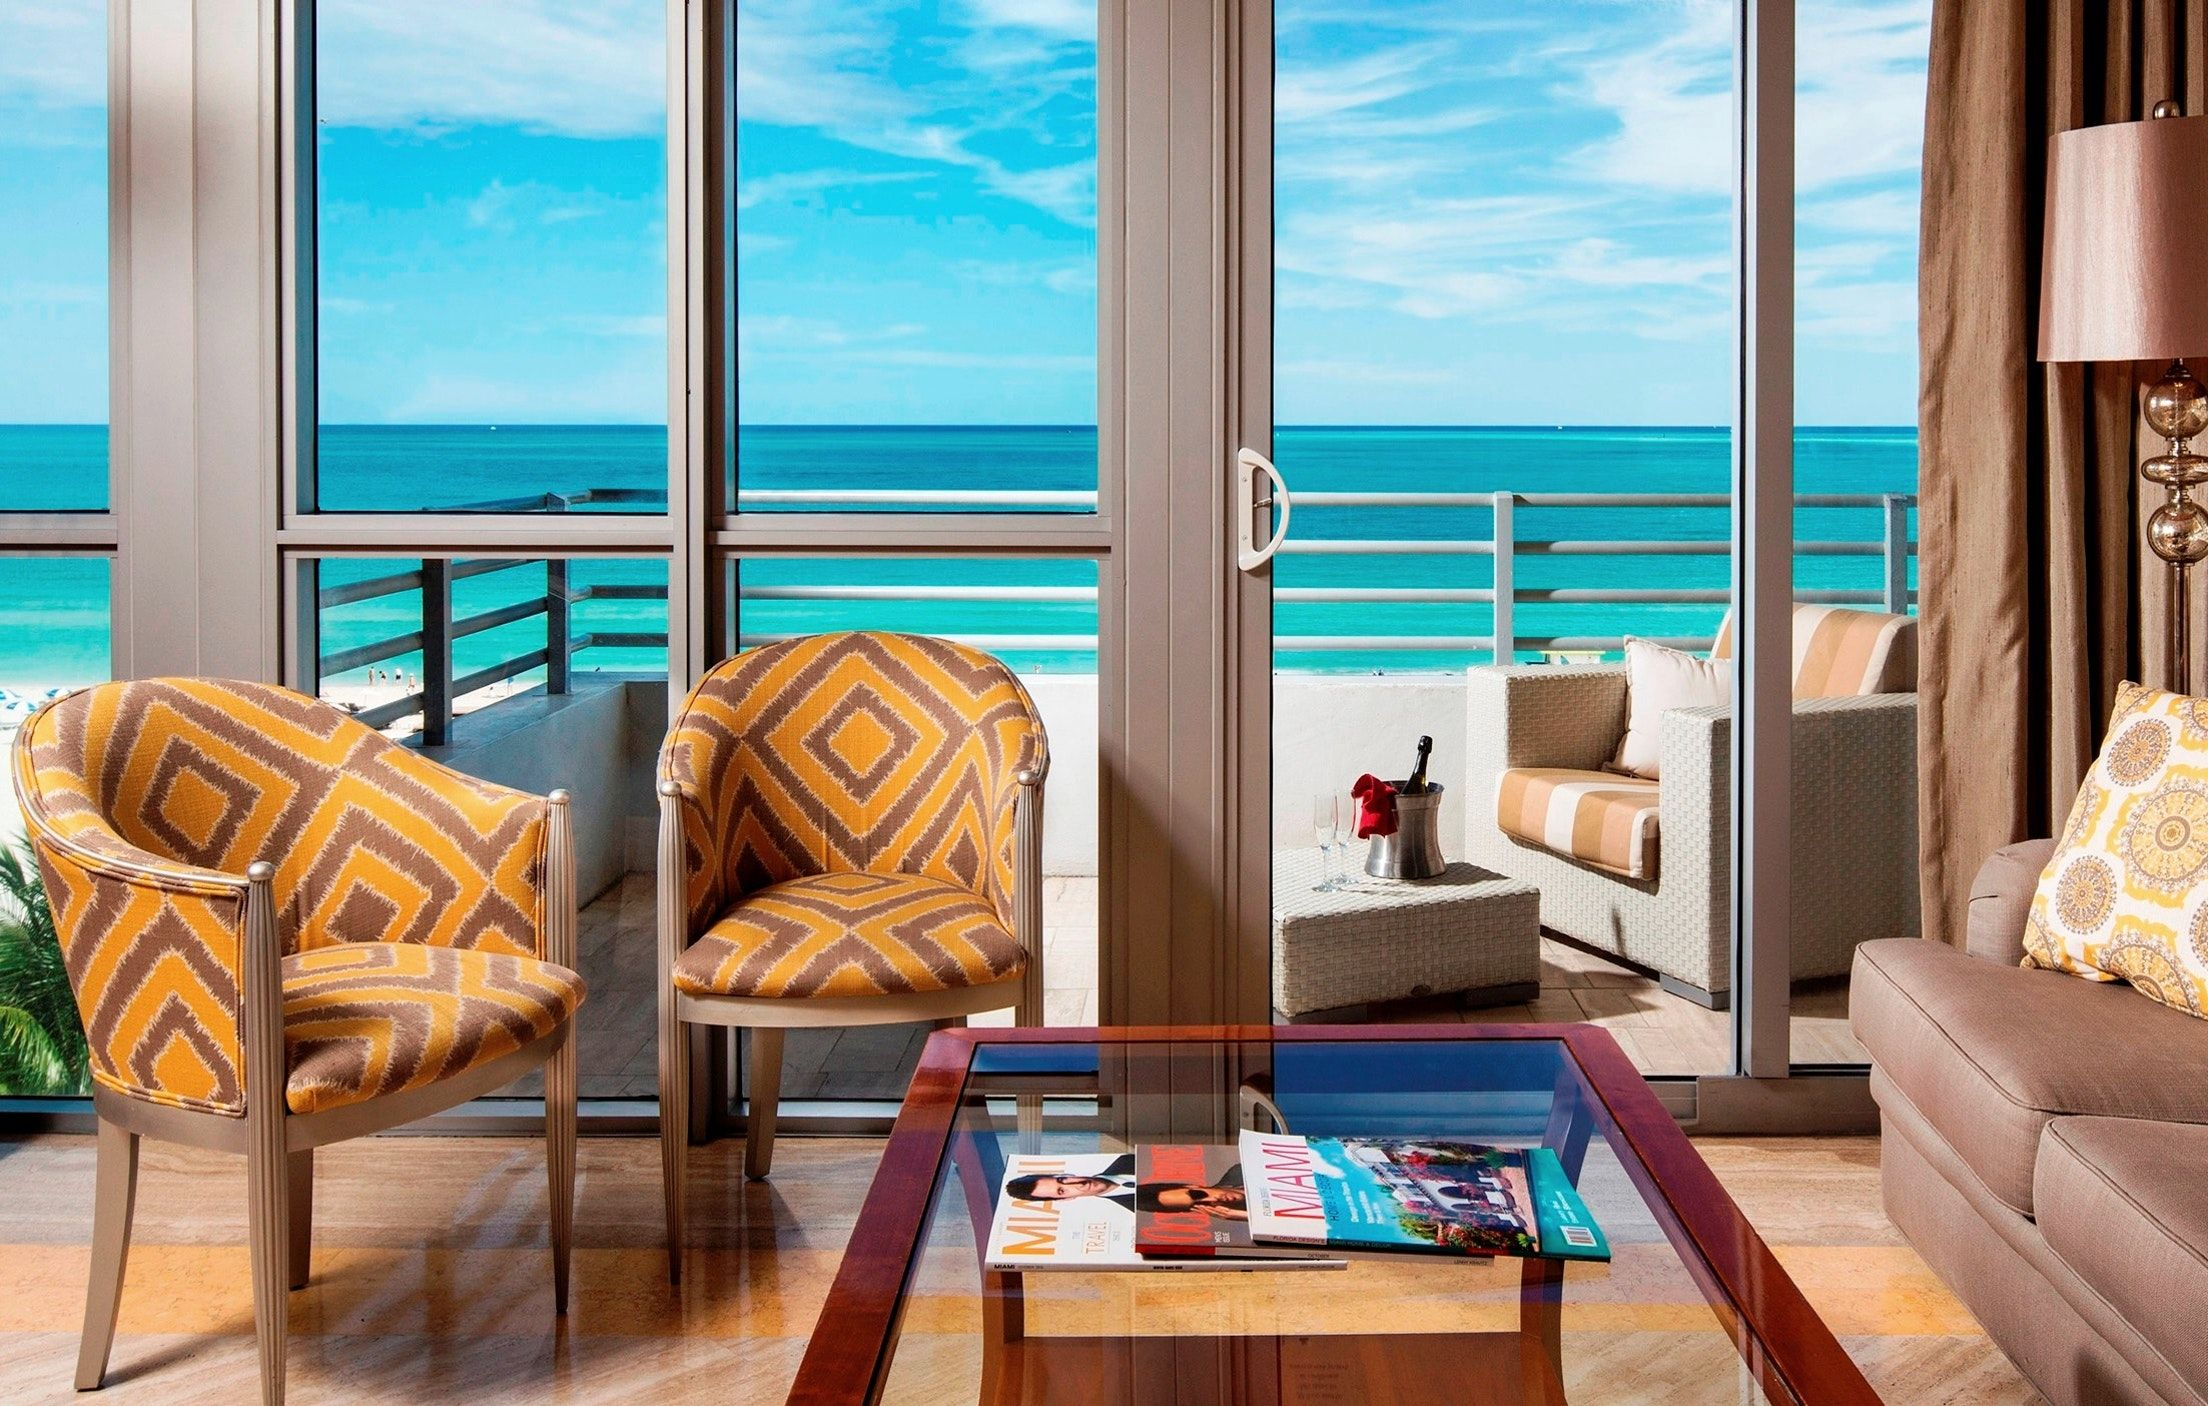 Book the Two Bedroom Suite Oceanfront at Hilton Bentley